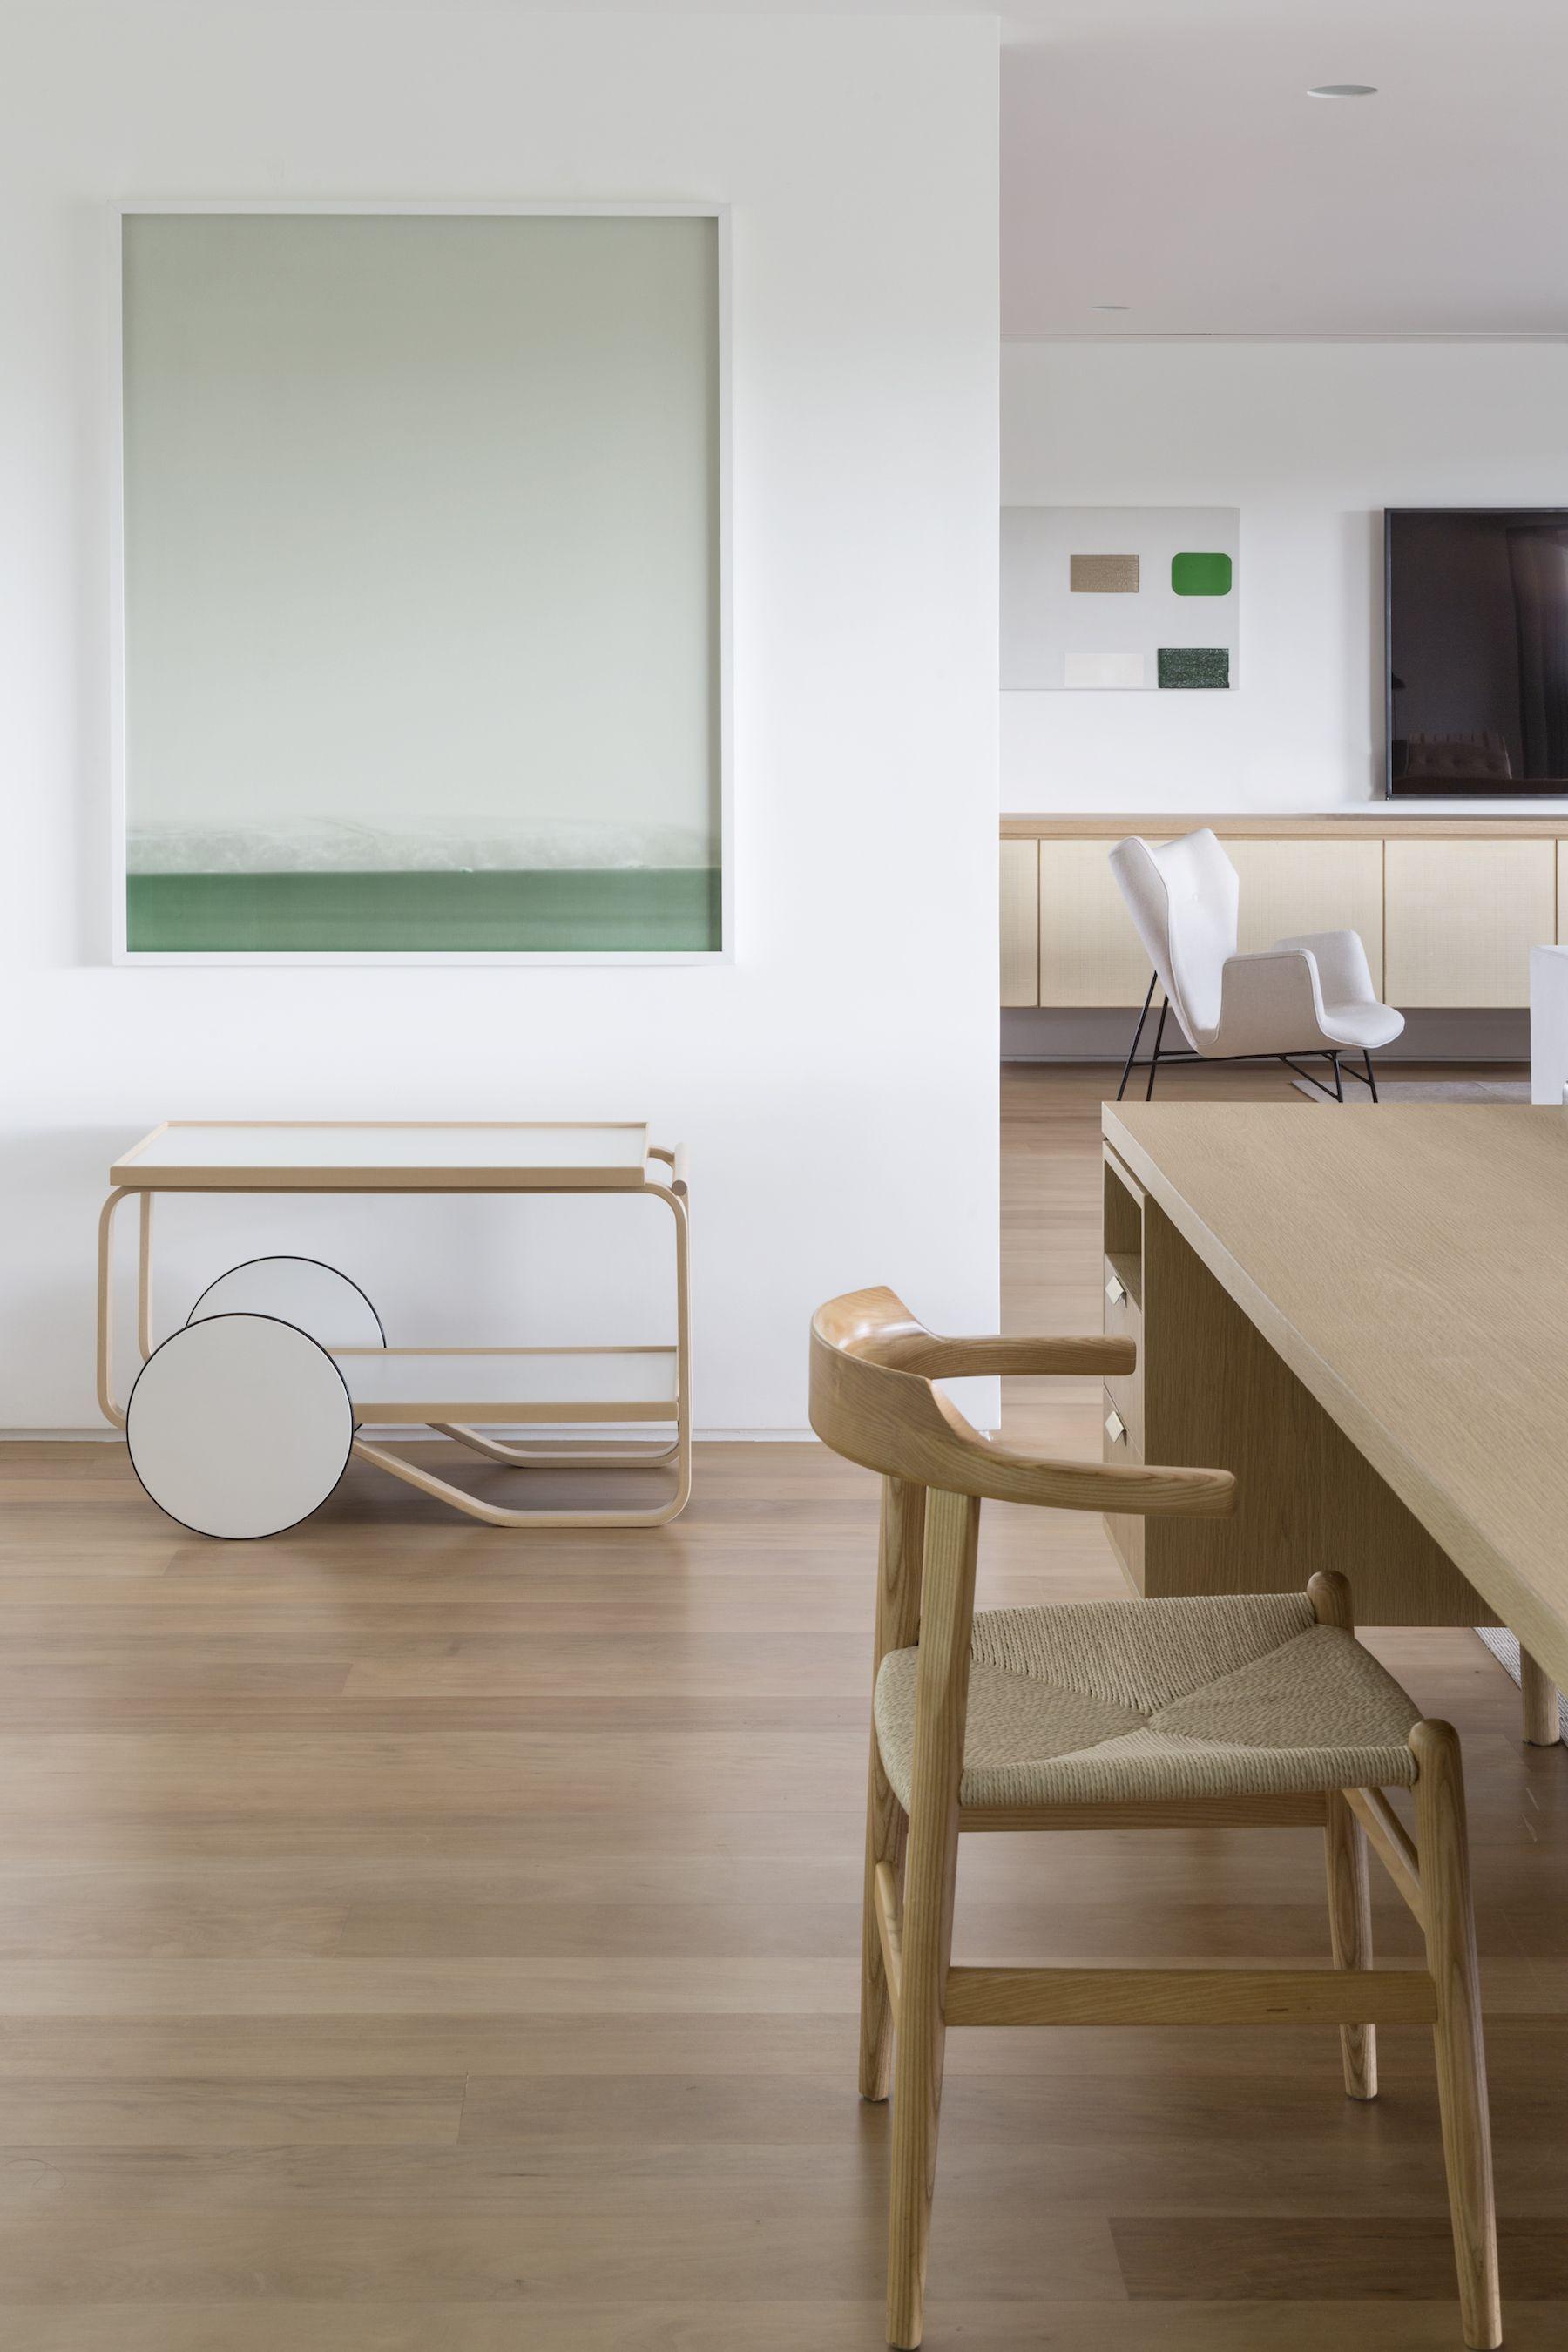 Apartment villa lobos by felipe hess interior design hd bathroom interior design interior design